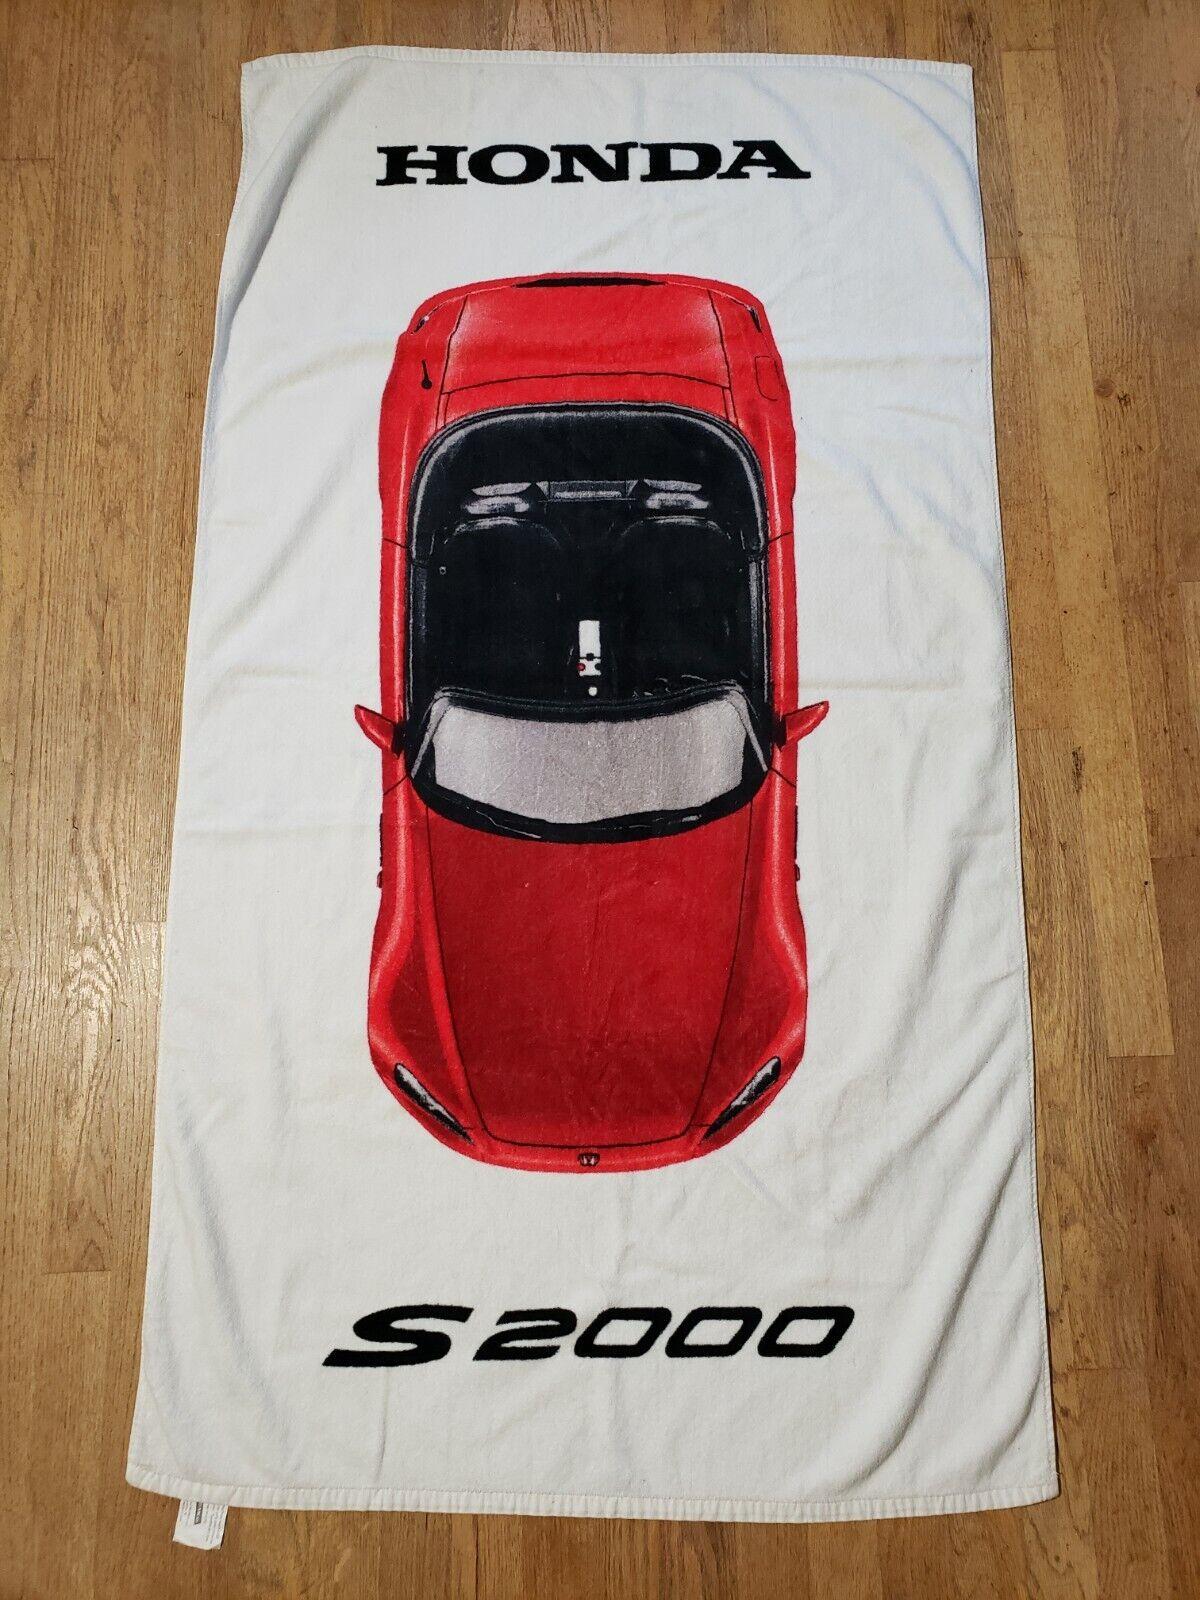 Rare Promos Honda S2000 Promotional Beach Towel Cotton White Red USA